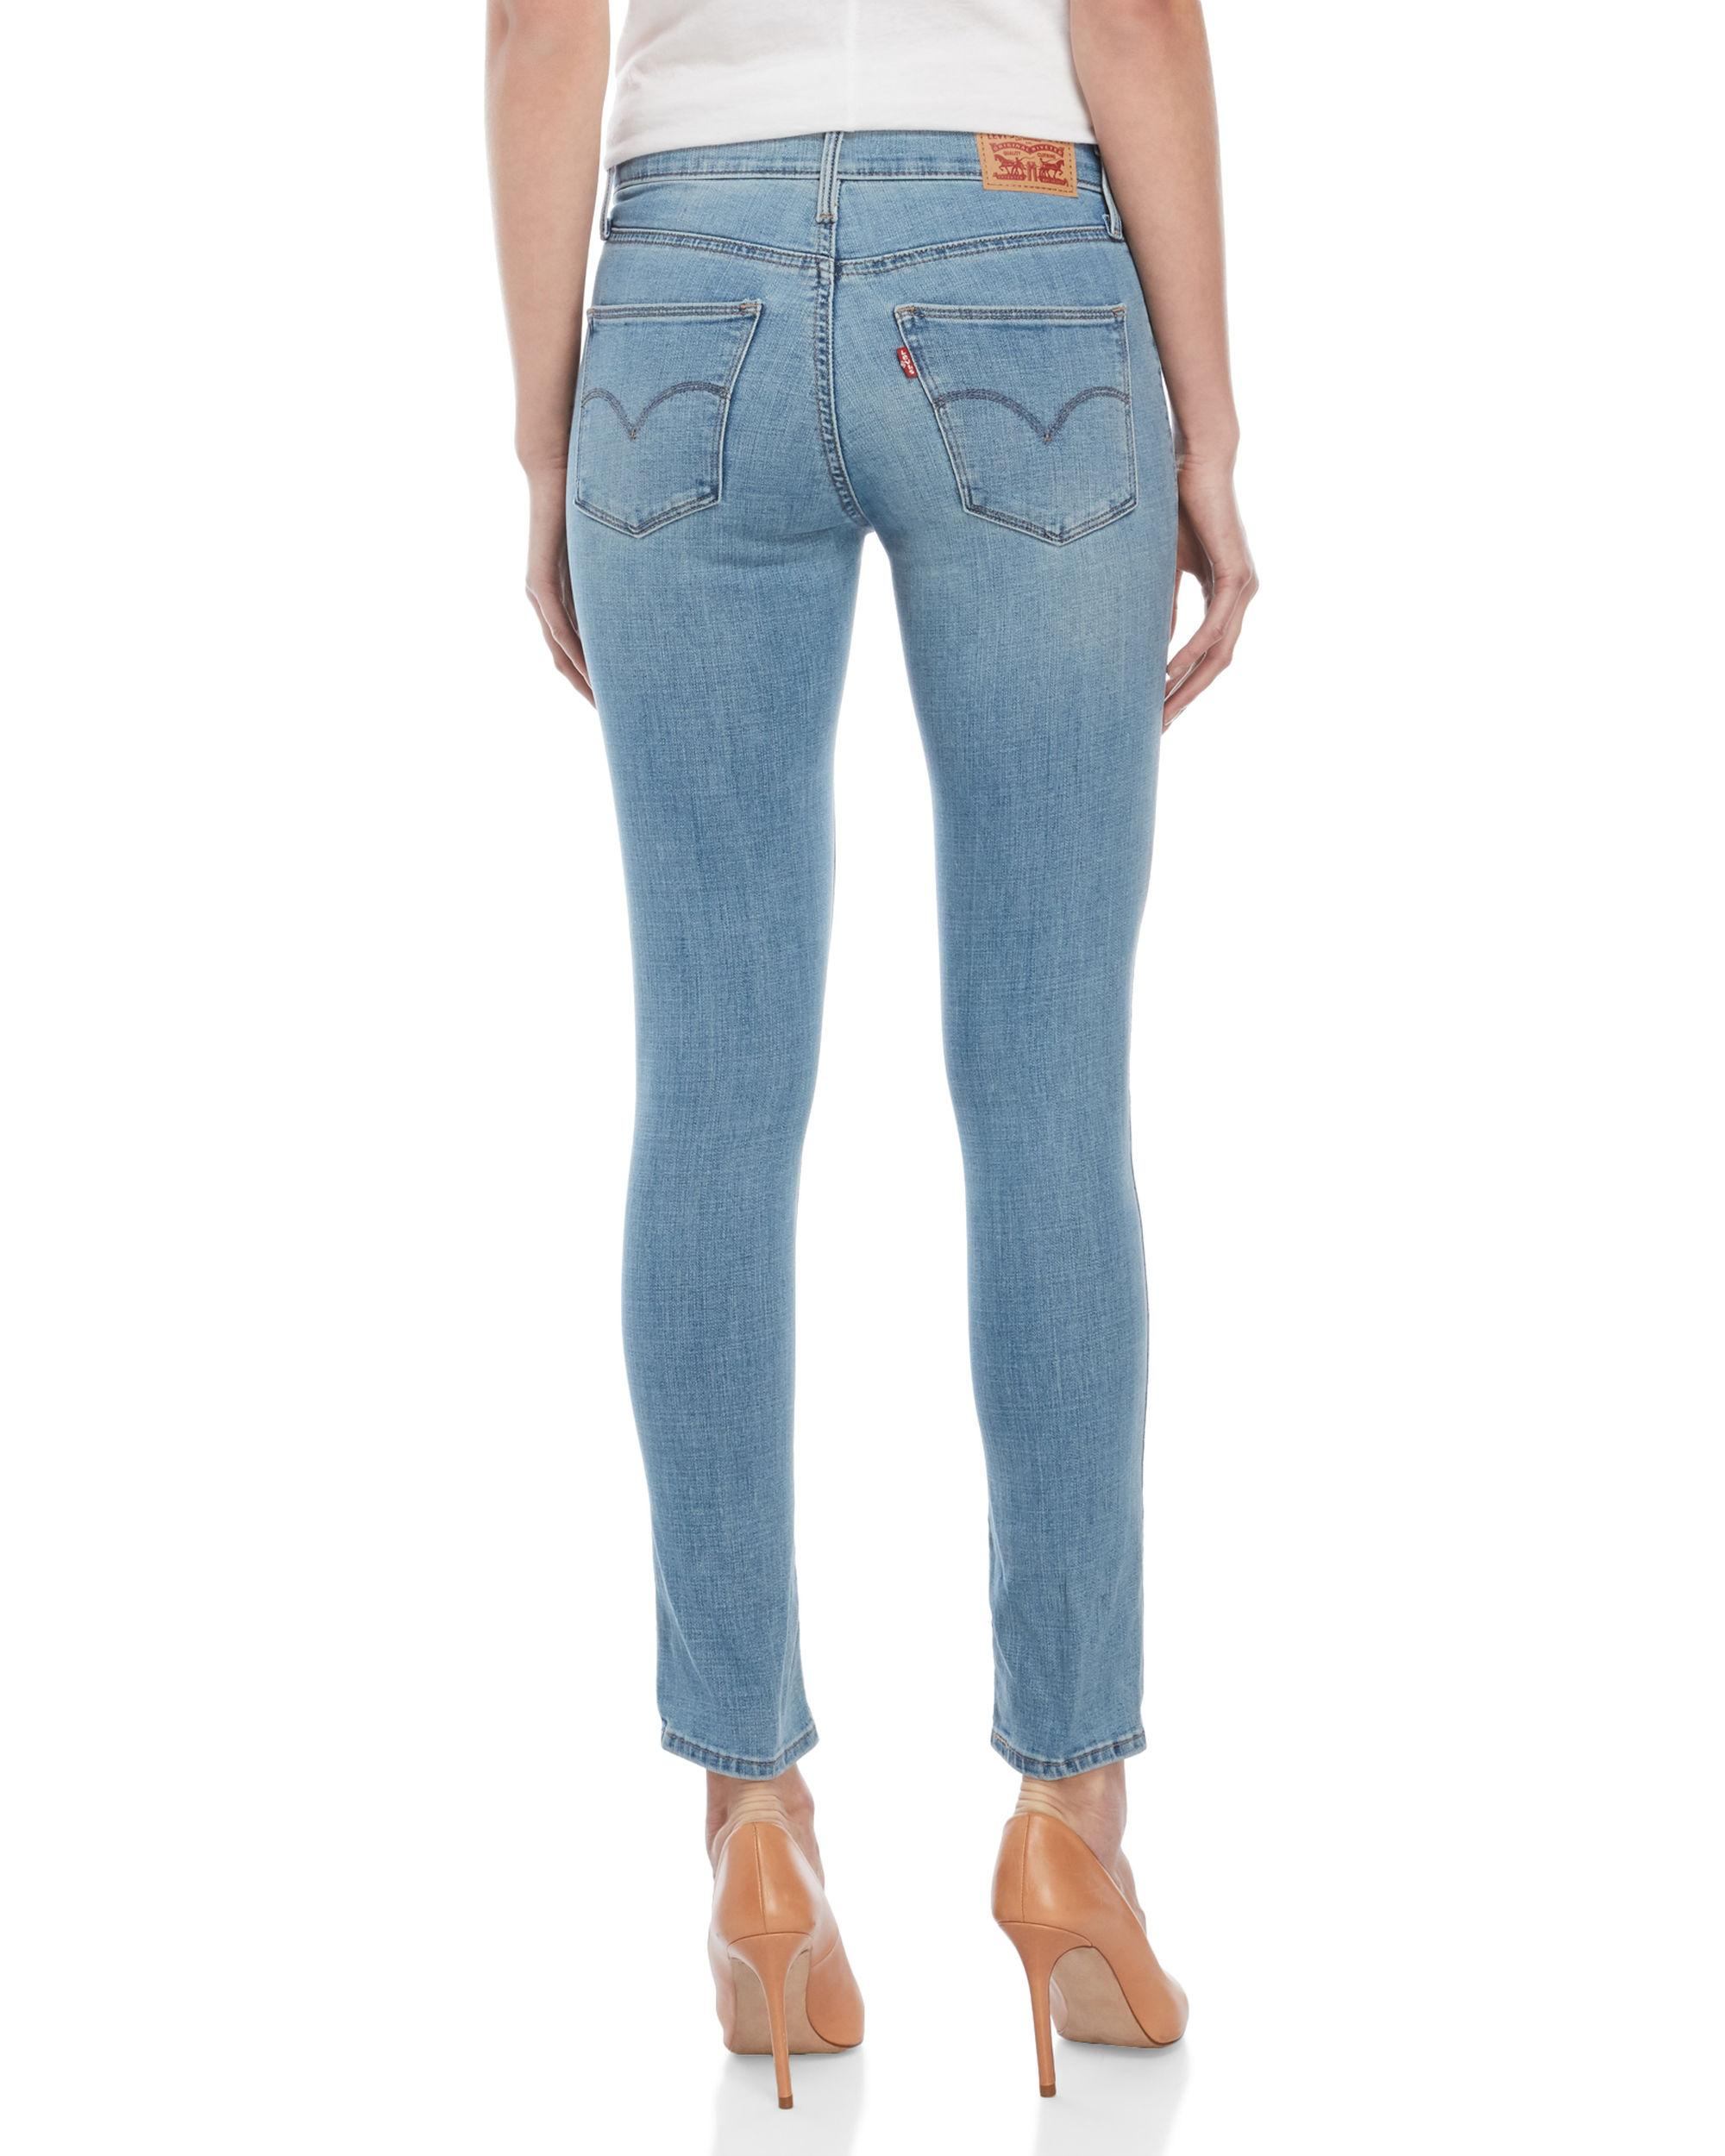 Starry Slimming Jeans Lyst Blue In Levi's Bright Skinny lK1TFJc3